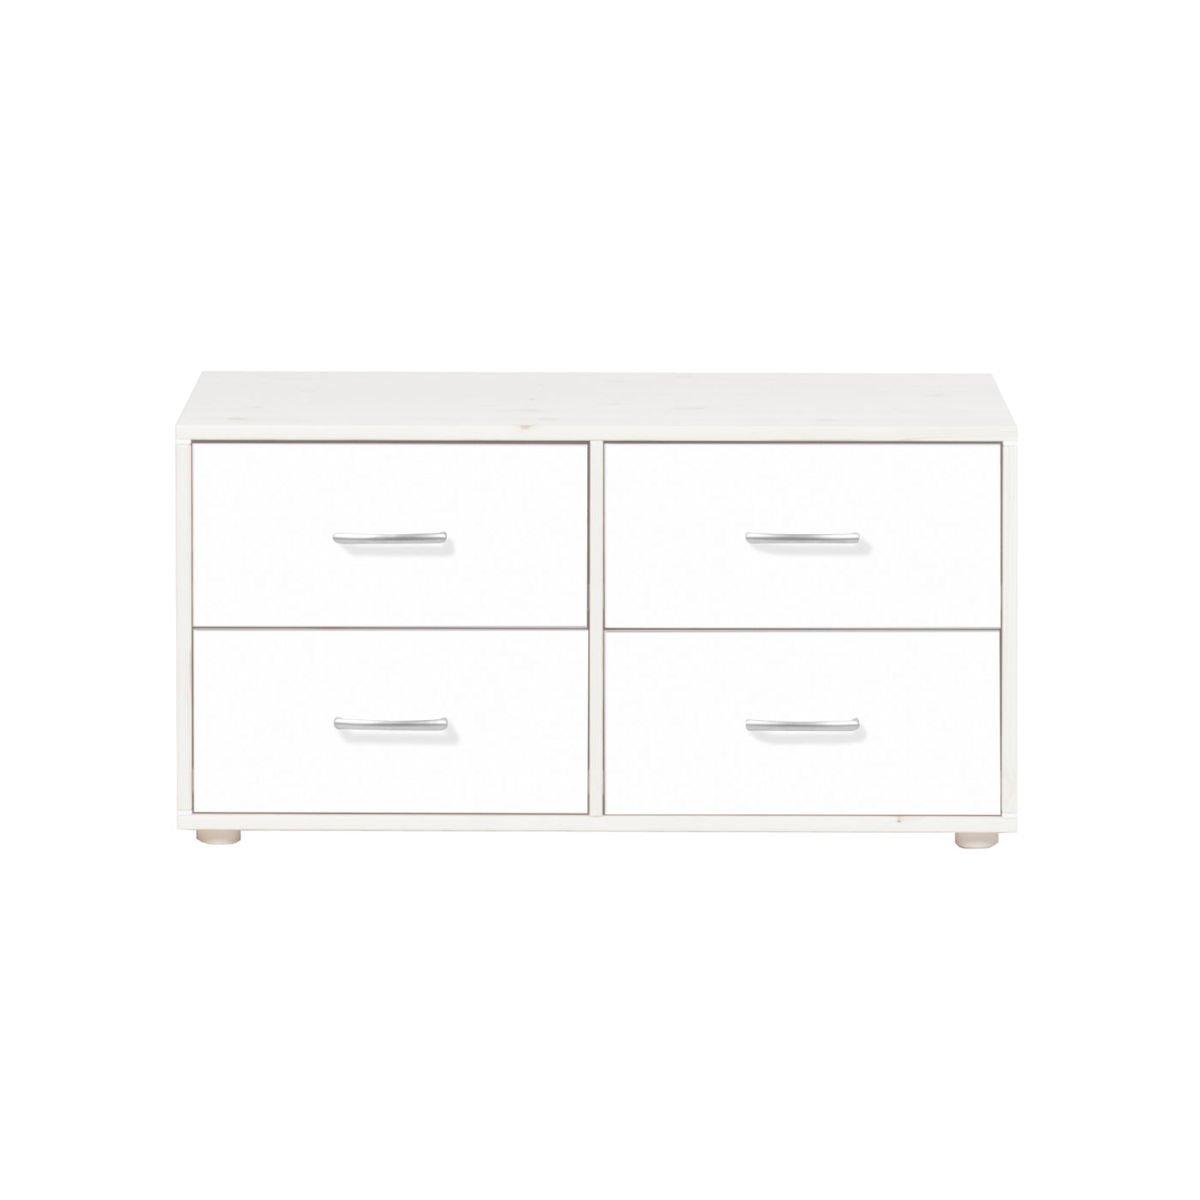 classic kommode 4 sch be kieferwei lack wei wei 315. Black Bedroom Furniture Sets. Home Design Ideas